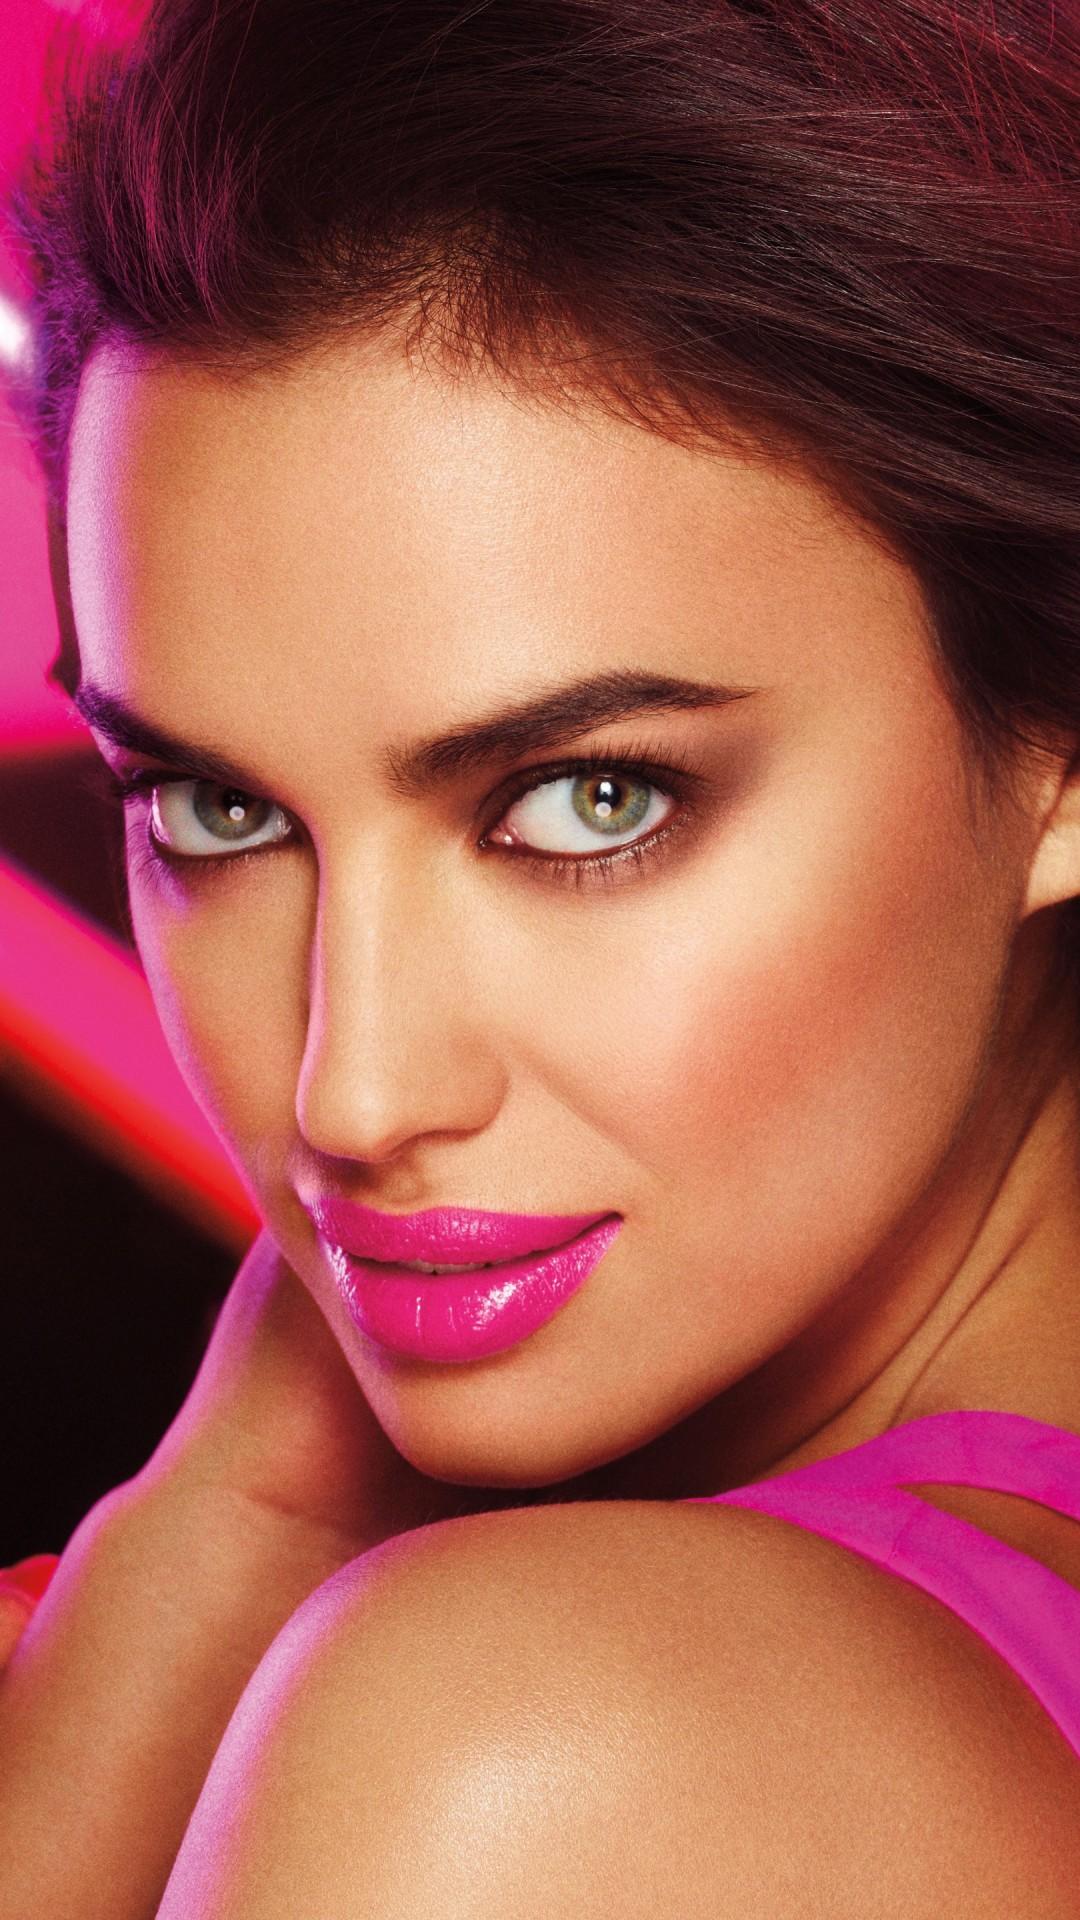 Wallpaper Irina Shayk, Top Fashion Models, Model, Brunette